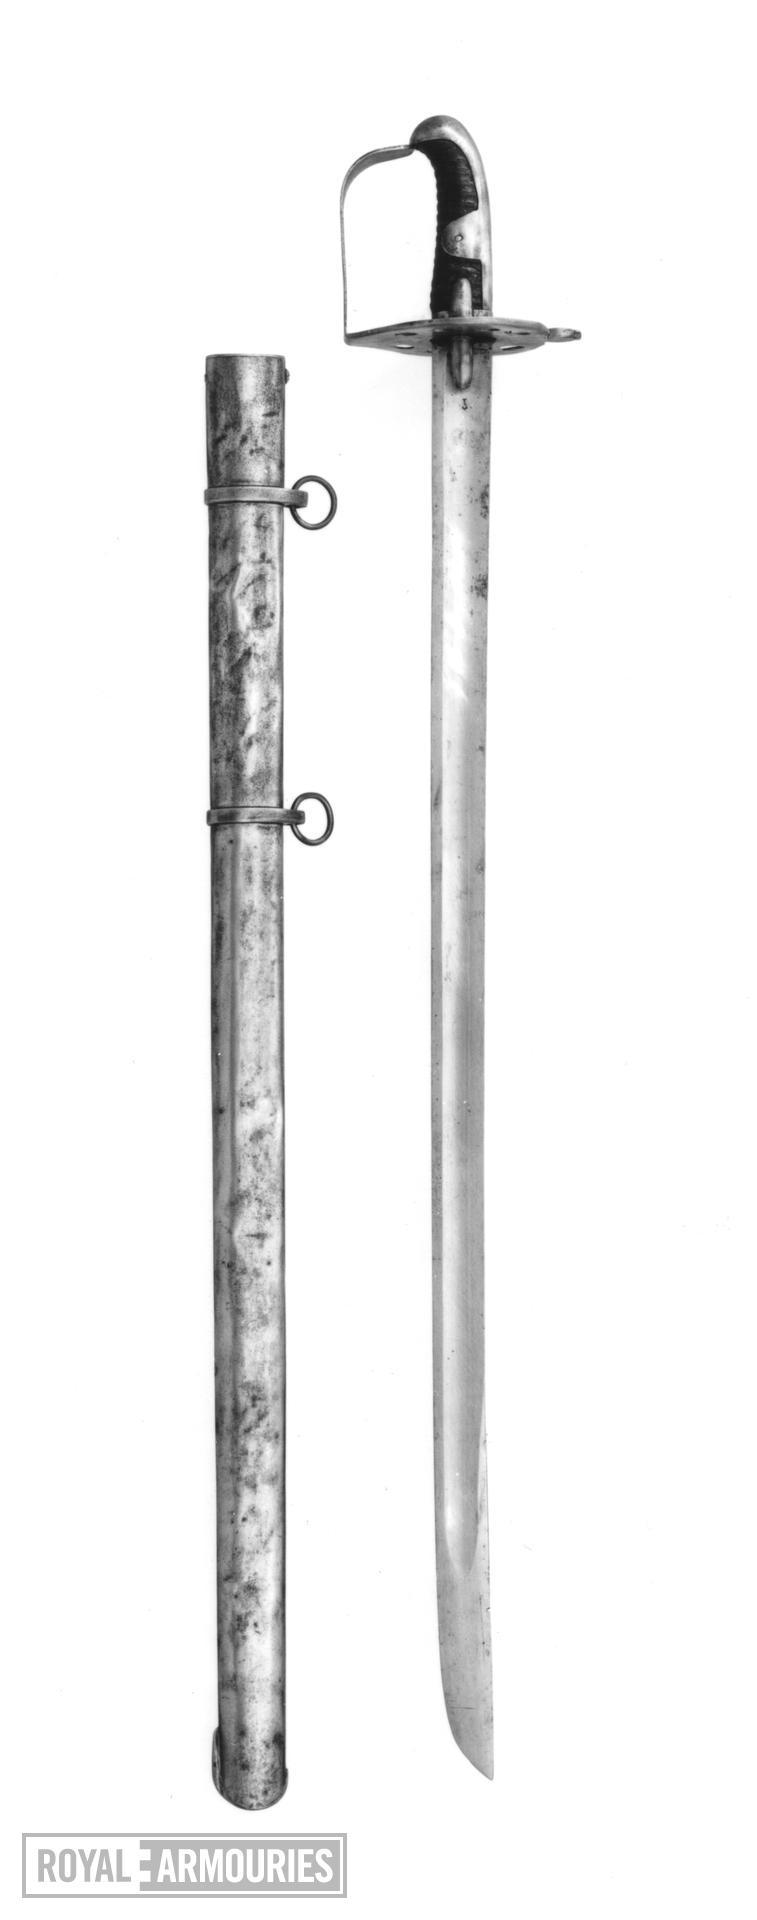 Sword - Heavy Cavalry Sword Pattern 1796 Heavy Cavalry sword